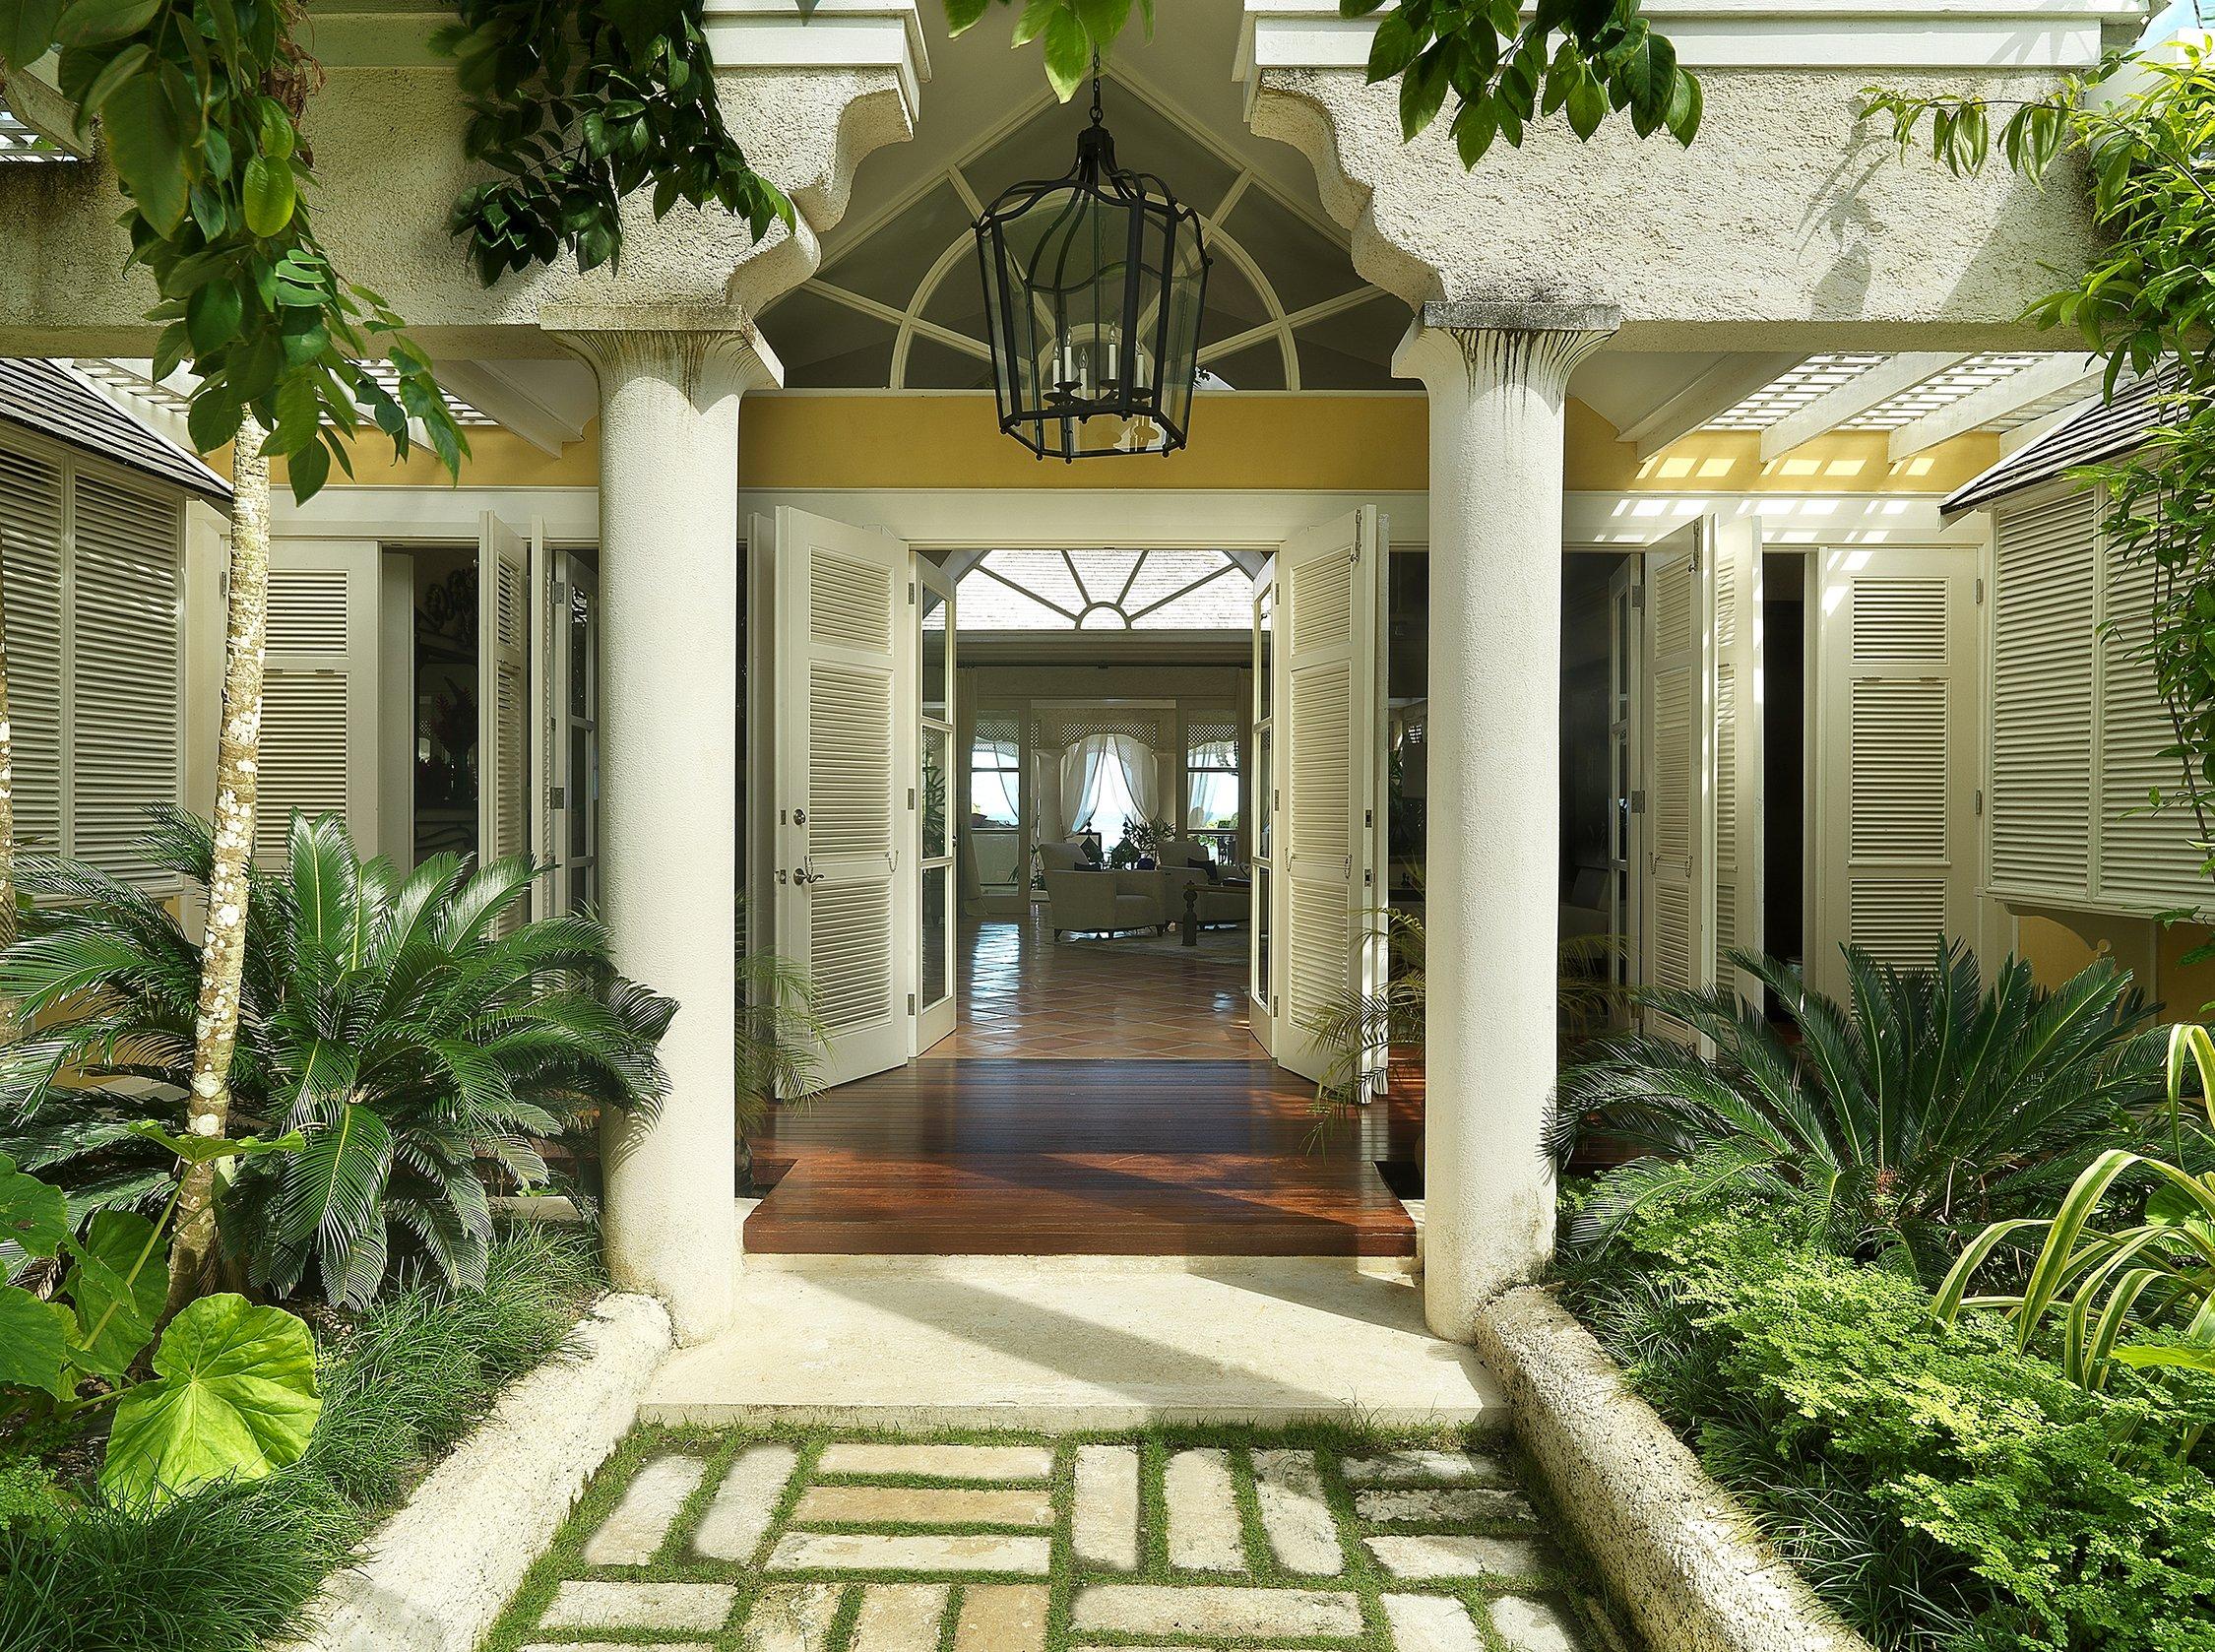 Entry Villa in the Caribbean